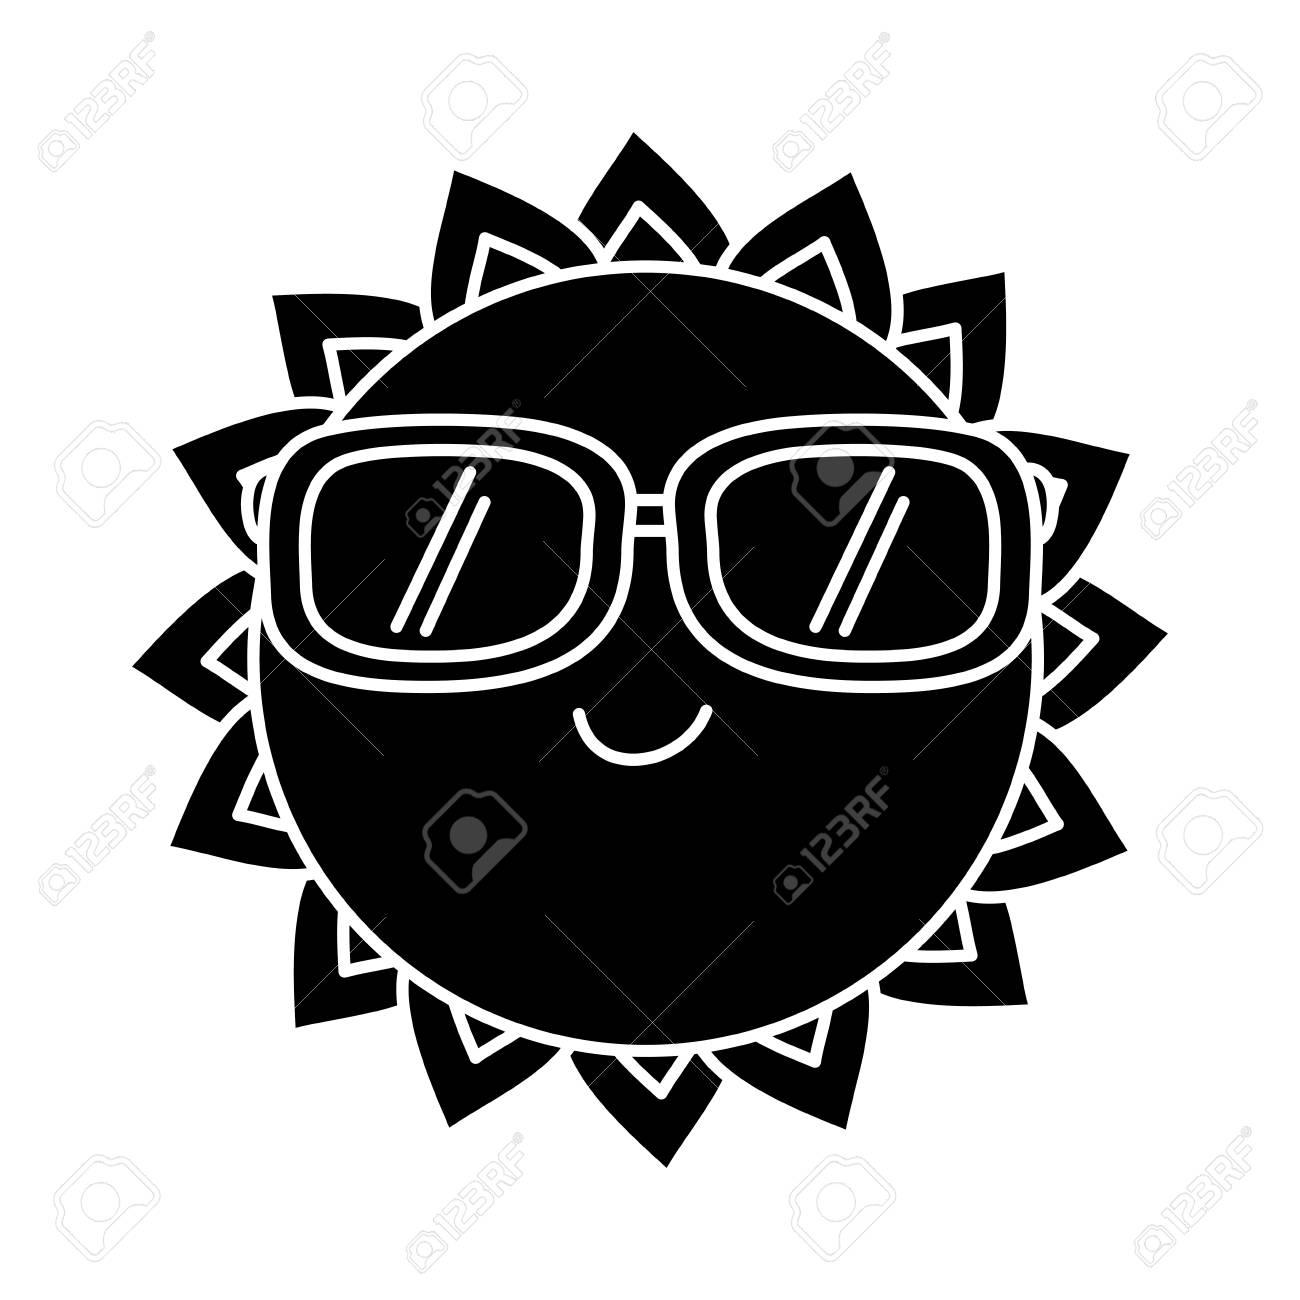 e5dc68f8e8 cartoon sun wearing sunglasses summer character vector illustration black  and white design Stock Vector - 95335672